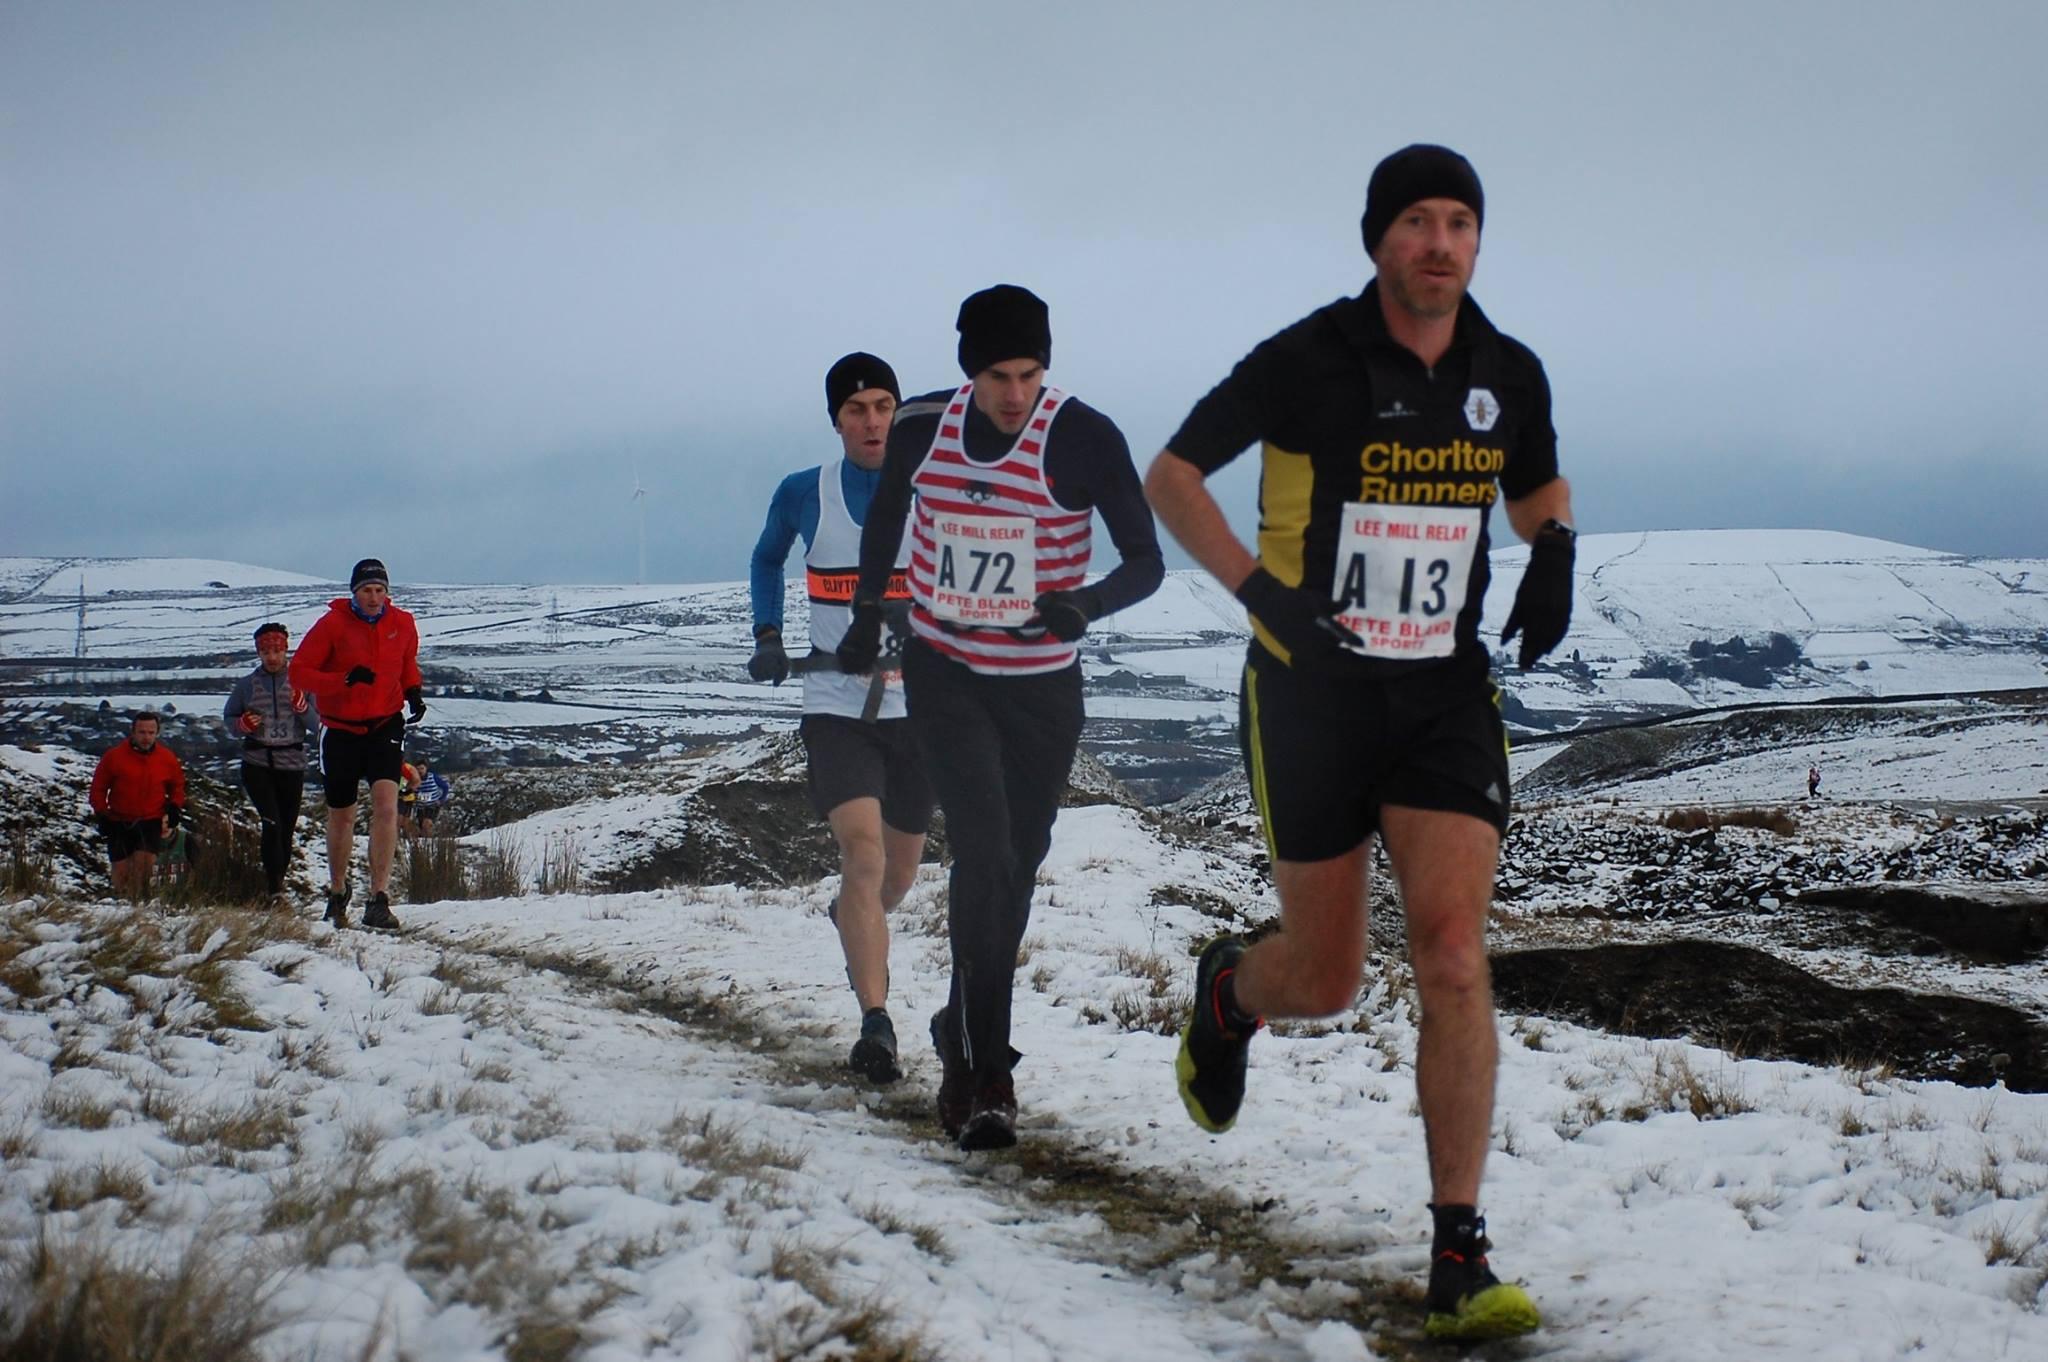 Carl Helliwell blazes a trail on Leg 1. Photo: mick Fryer